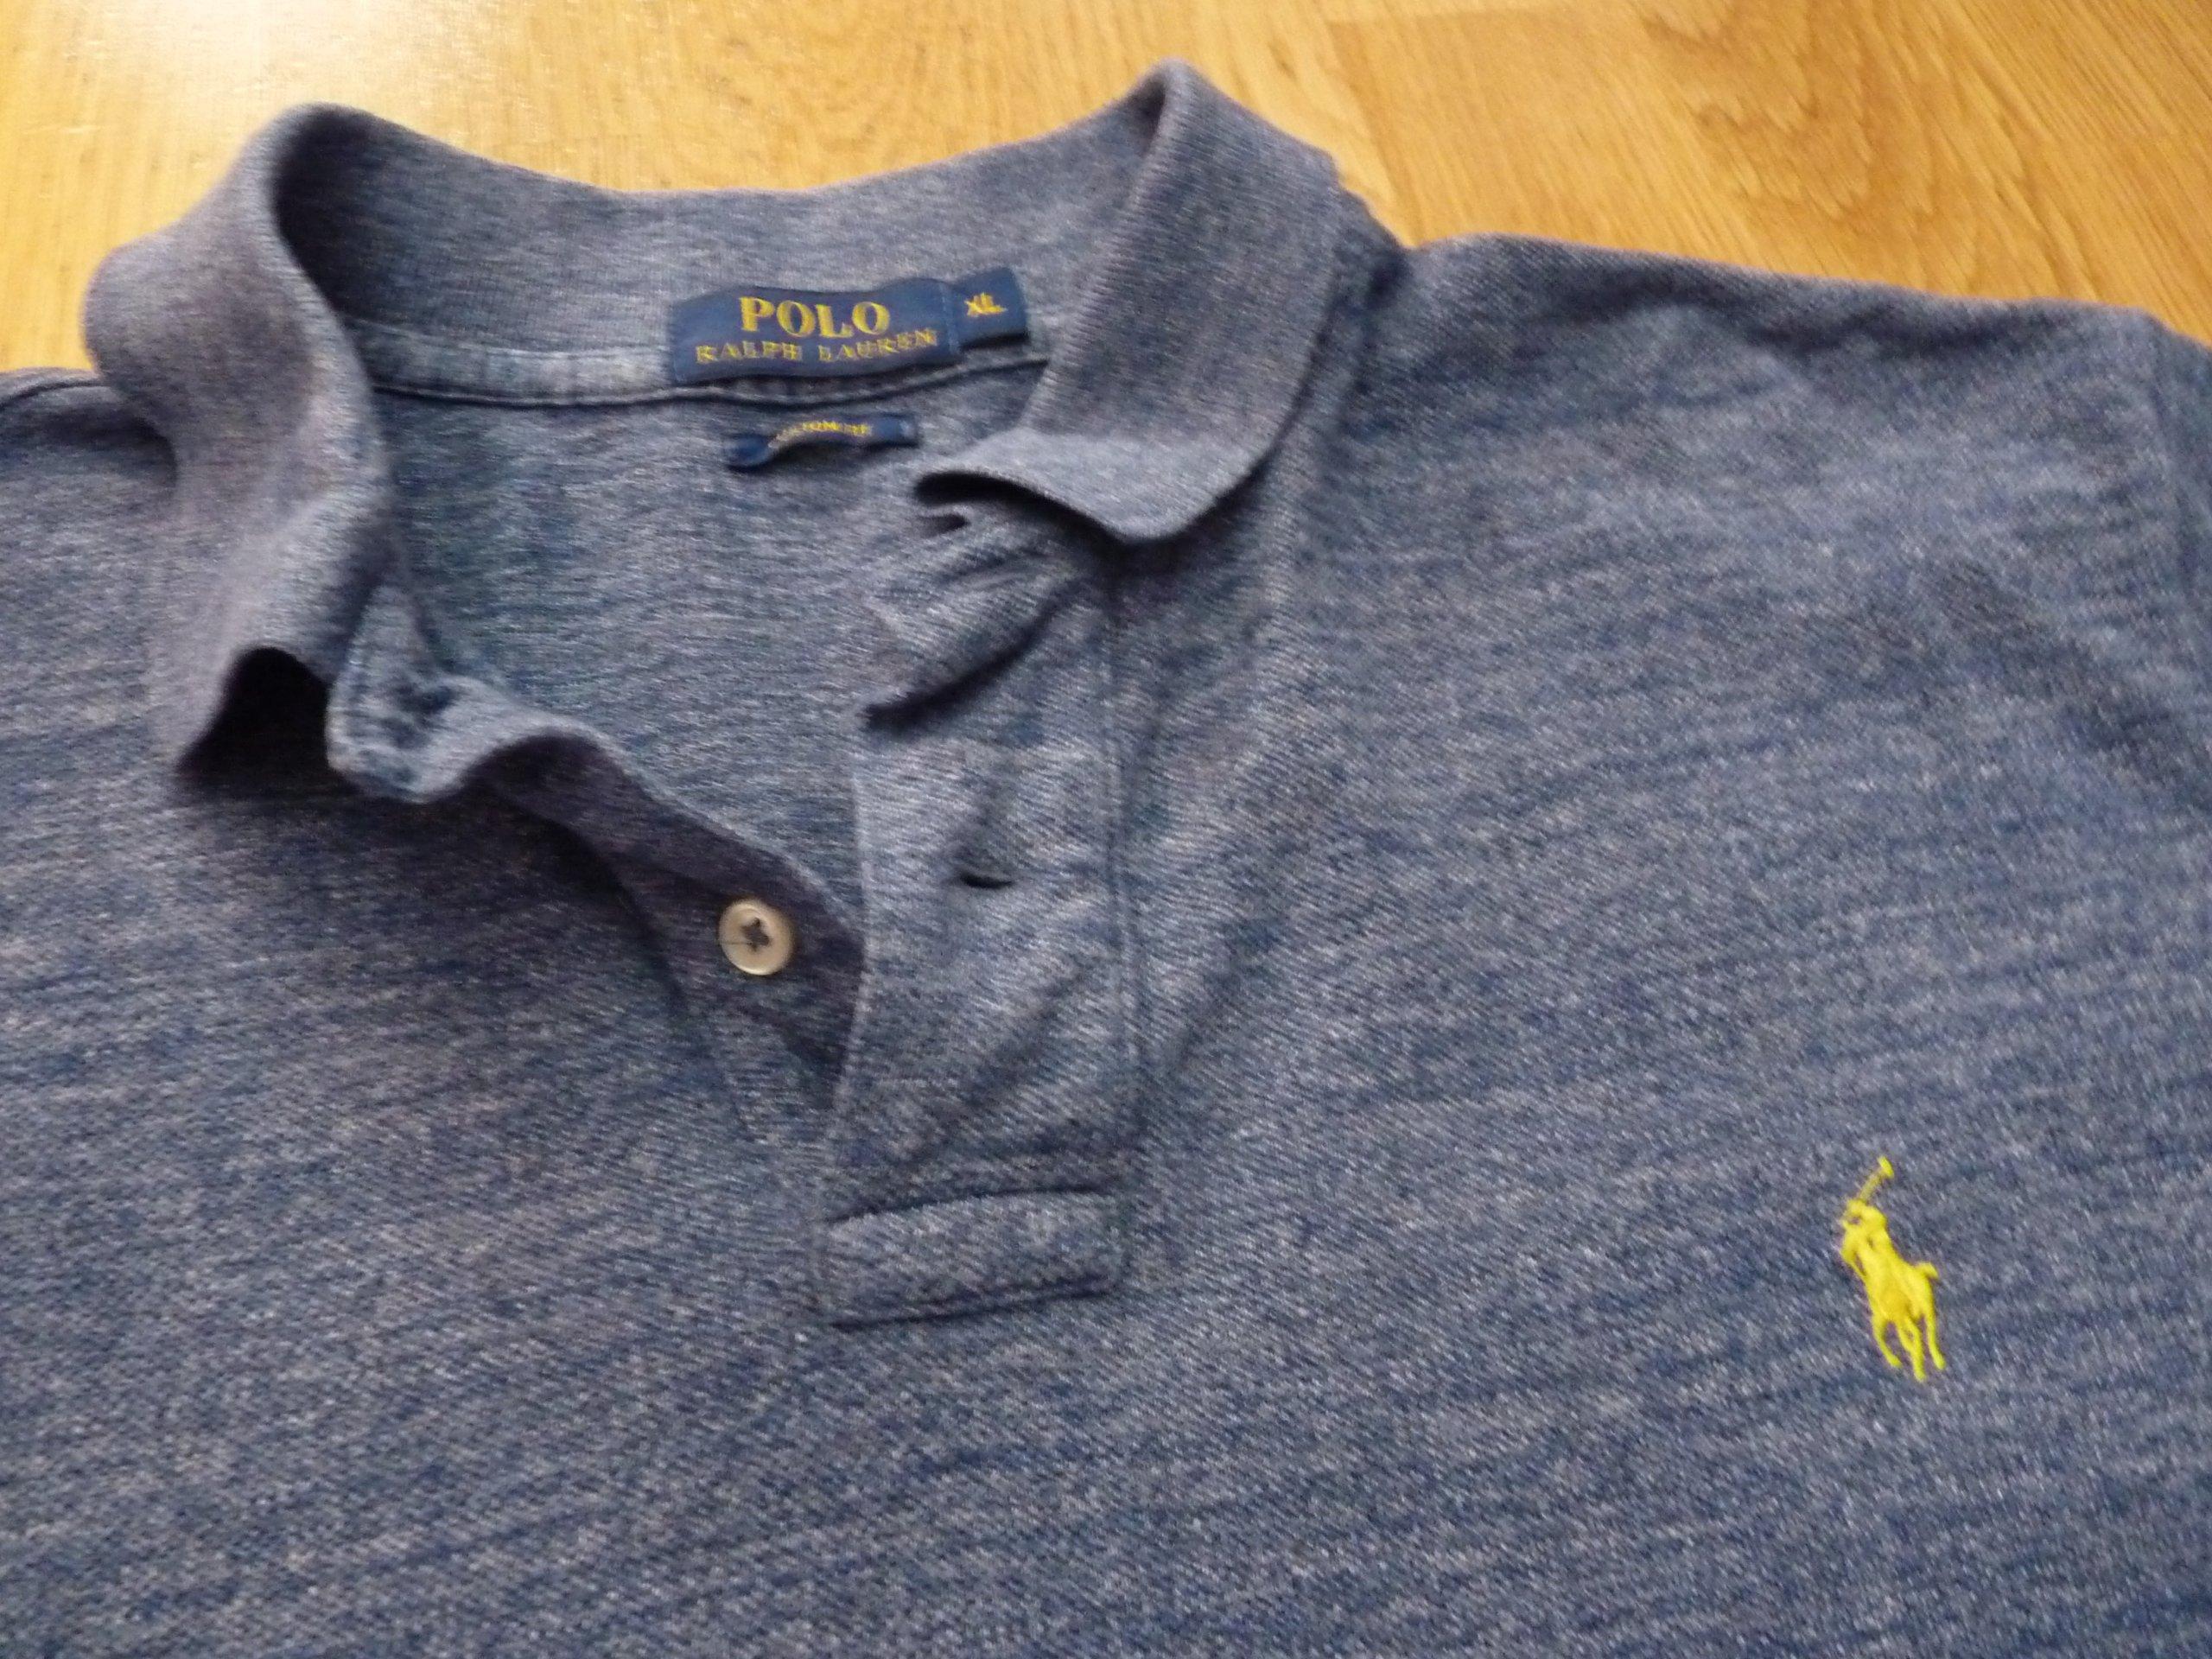 bf3b69000 RALPH LAUREN koszulka POLO męska XL - 7345388863 - oficjalne ...